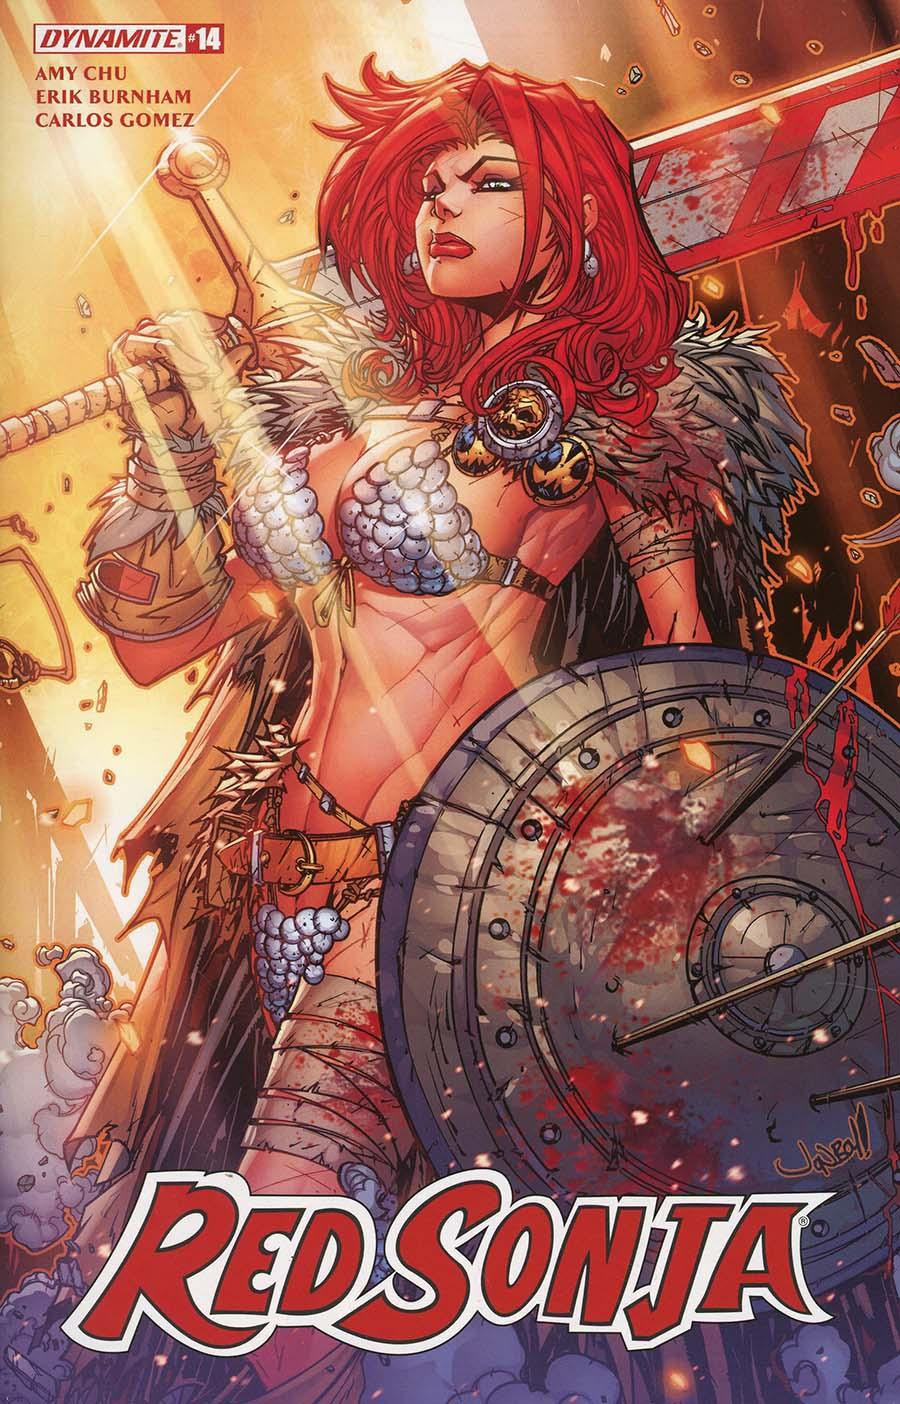 Red Sonja Vol 7 #14 Cover A Regular Jonboy Meyers Cover